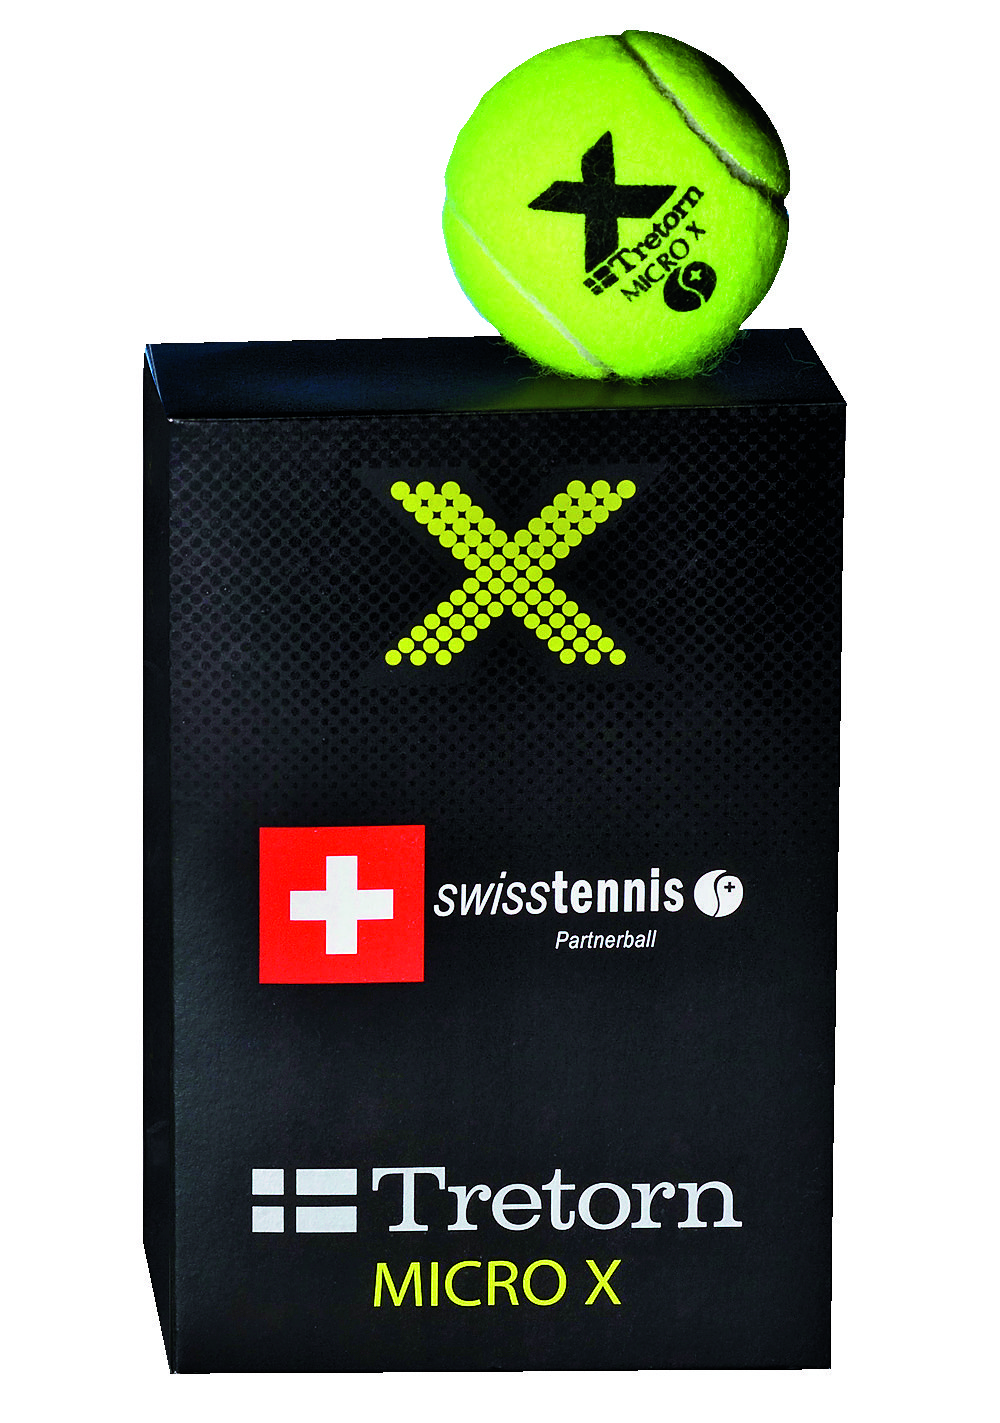 Tretorn Micro X Gialle (6x) Swiss Tennis